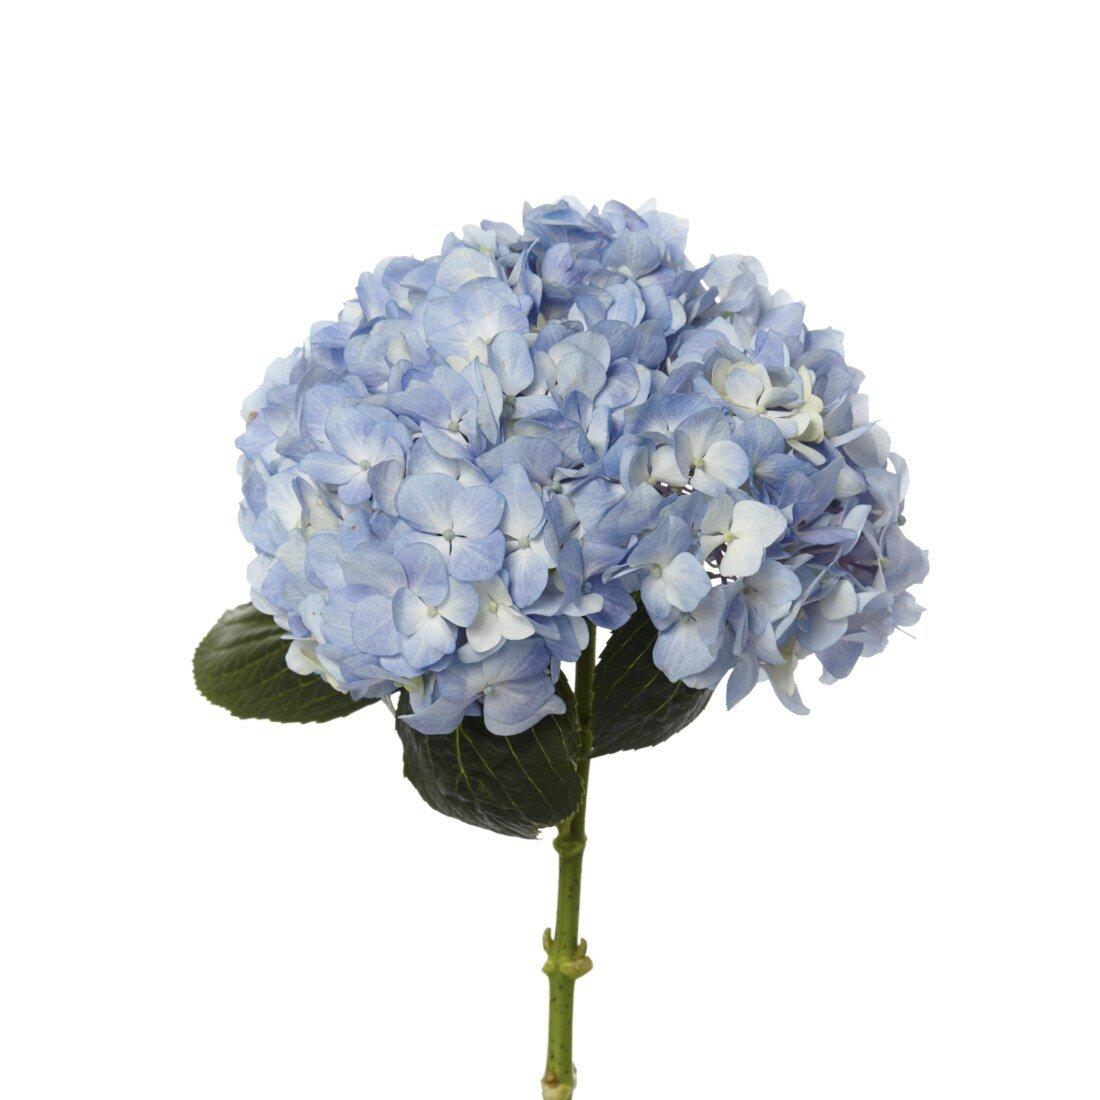 190_Hydrangea_Blue-1.jpg